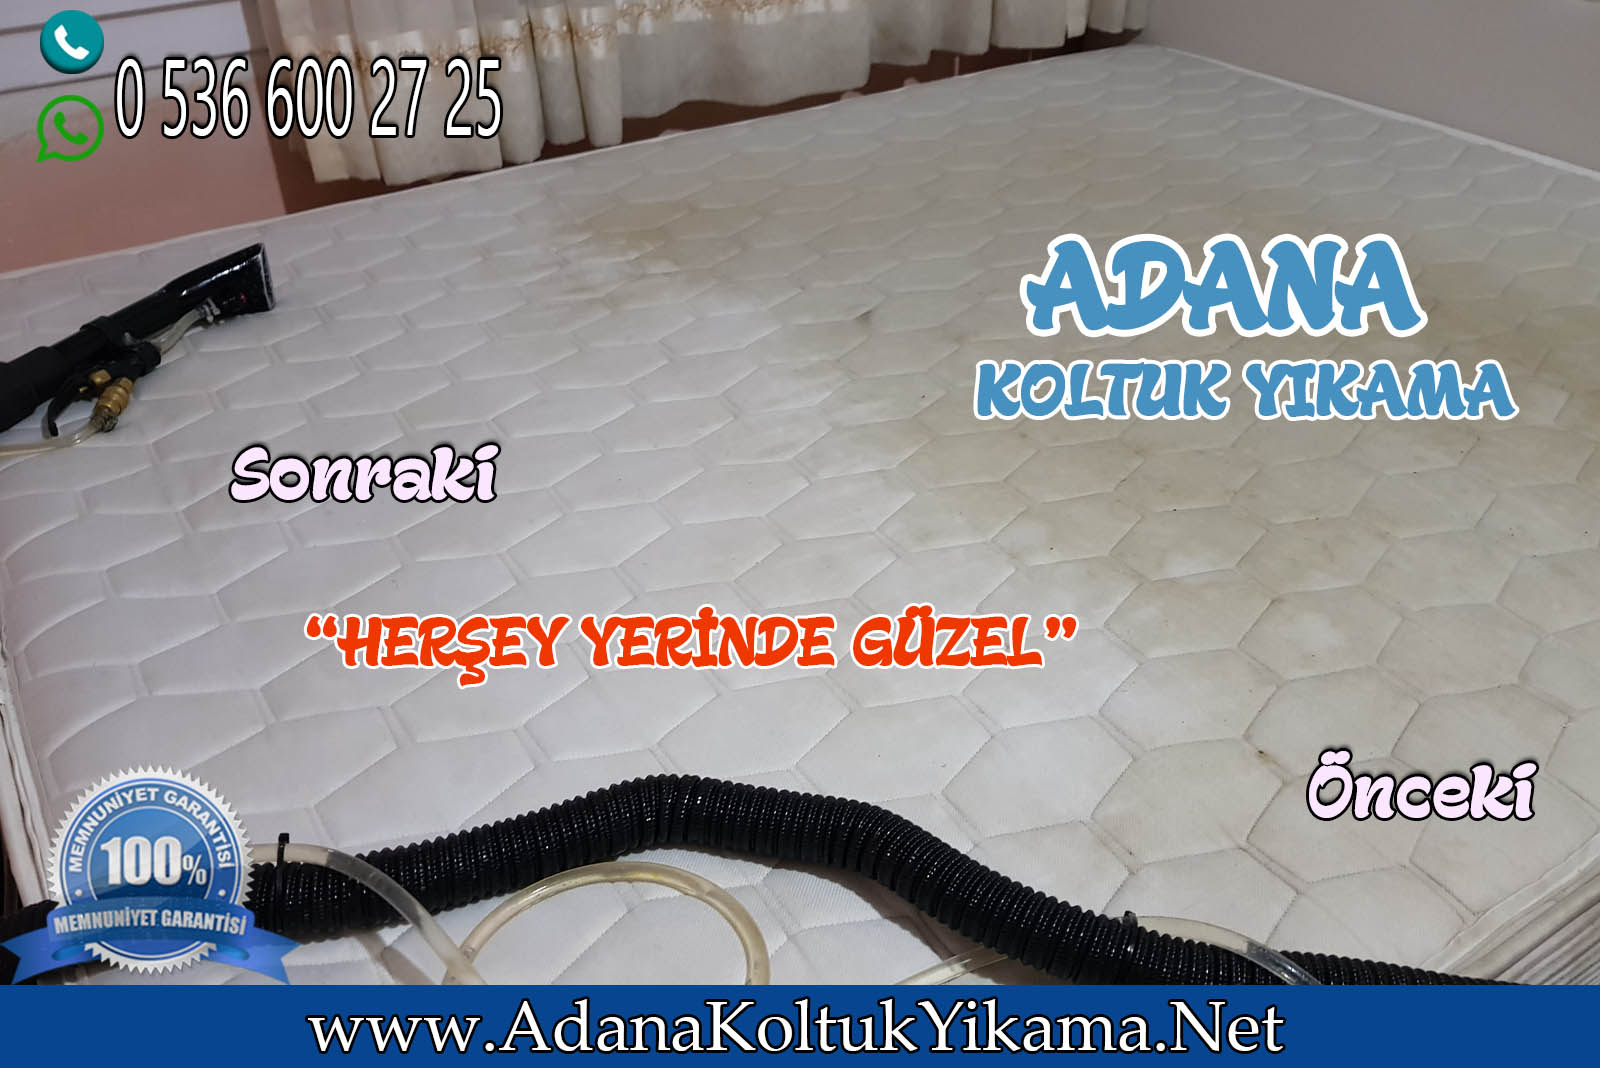 Adana Koltuk Yıkama + Mekan Yatak Yıkama ( Baraj Yolu )